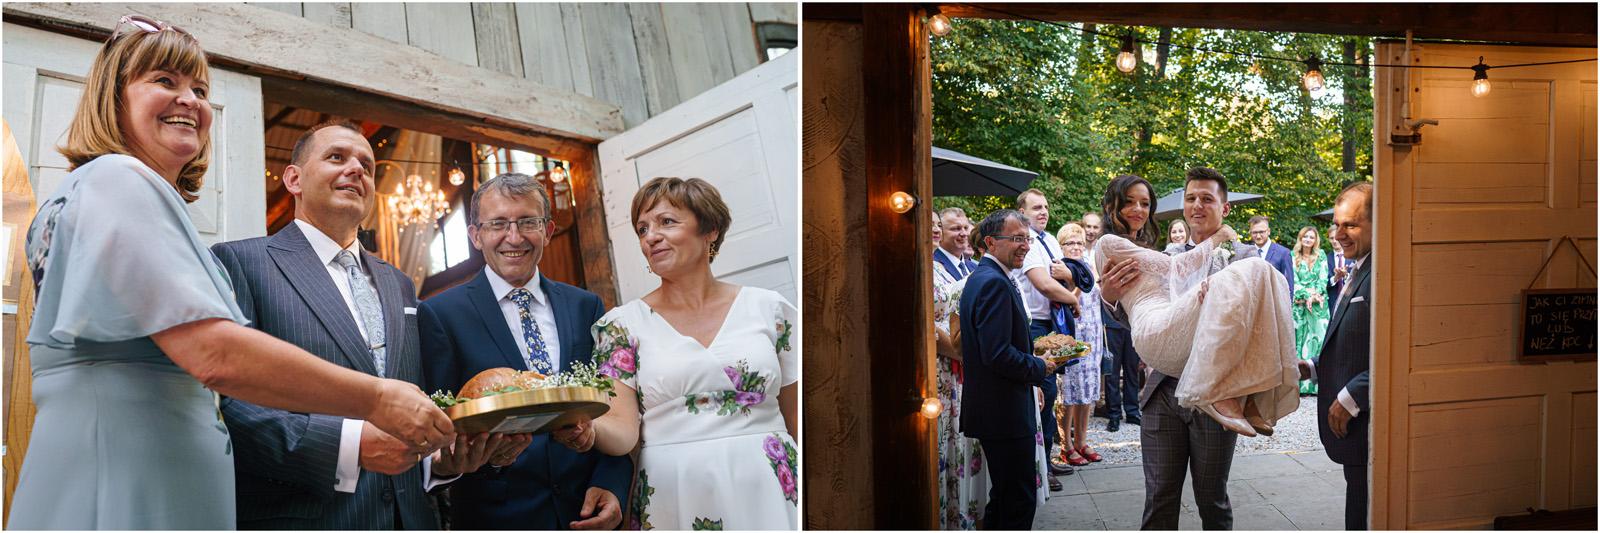 Ania & Mateusz | boho wesele w Stodole pod Kasztanami 82